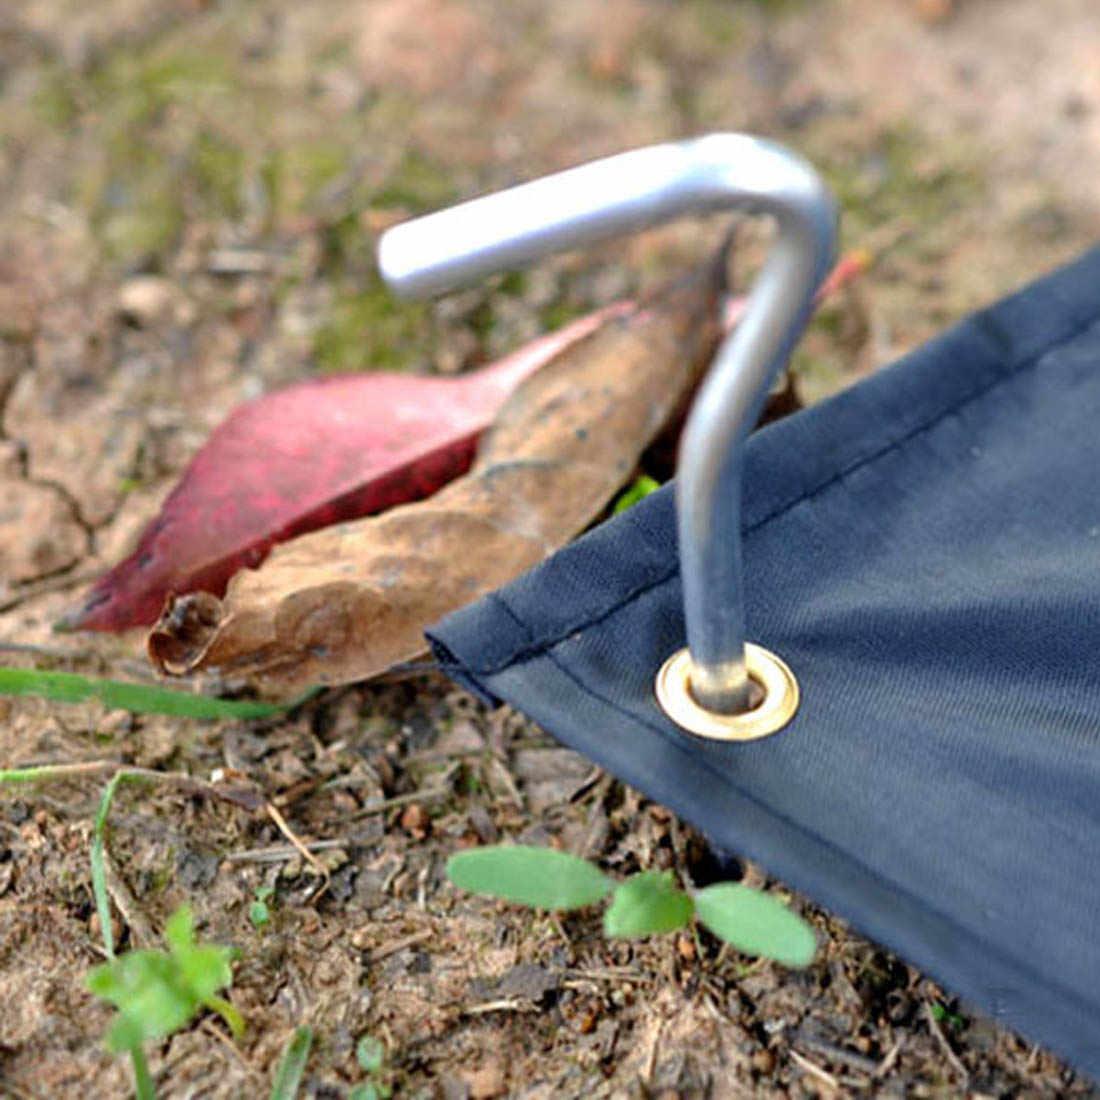 10 Pcs เต็นท์หมุดอลูมิเนียมเต็นท์เล็บเต็นท์ Stake เล็บ GROUND PIN Camping Hiking เครื่องมือกลางแจ้งเต็นท์อุปกรณ์เสริม